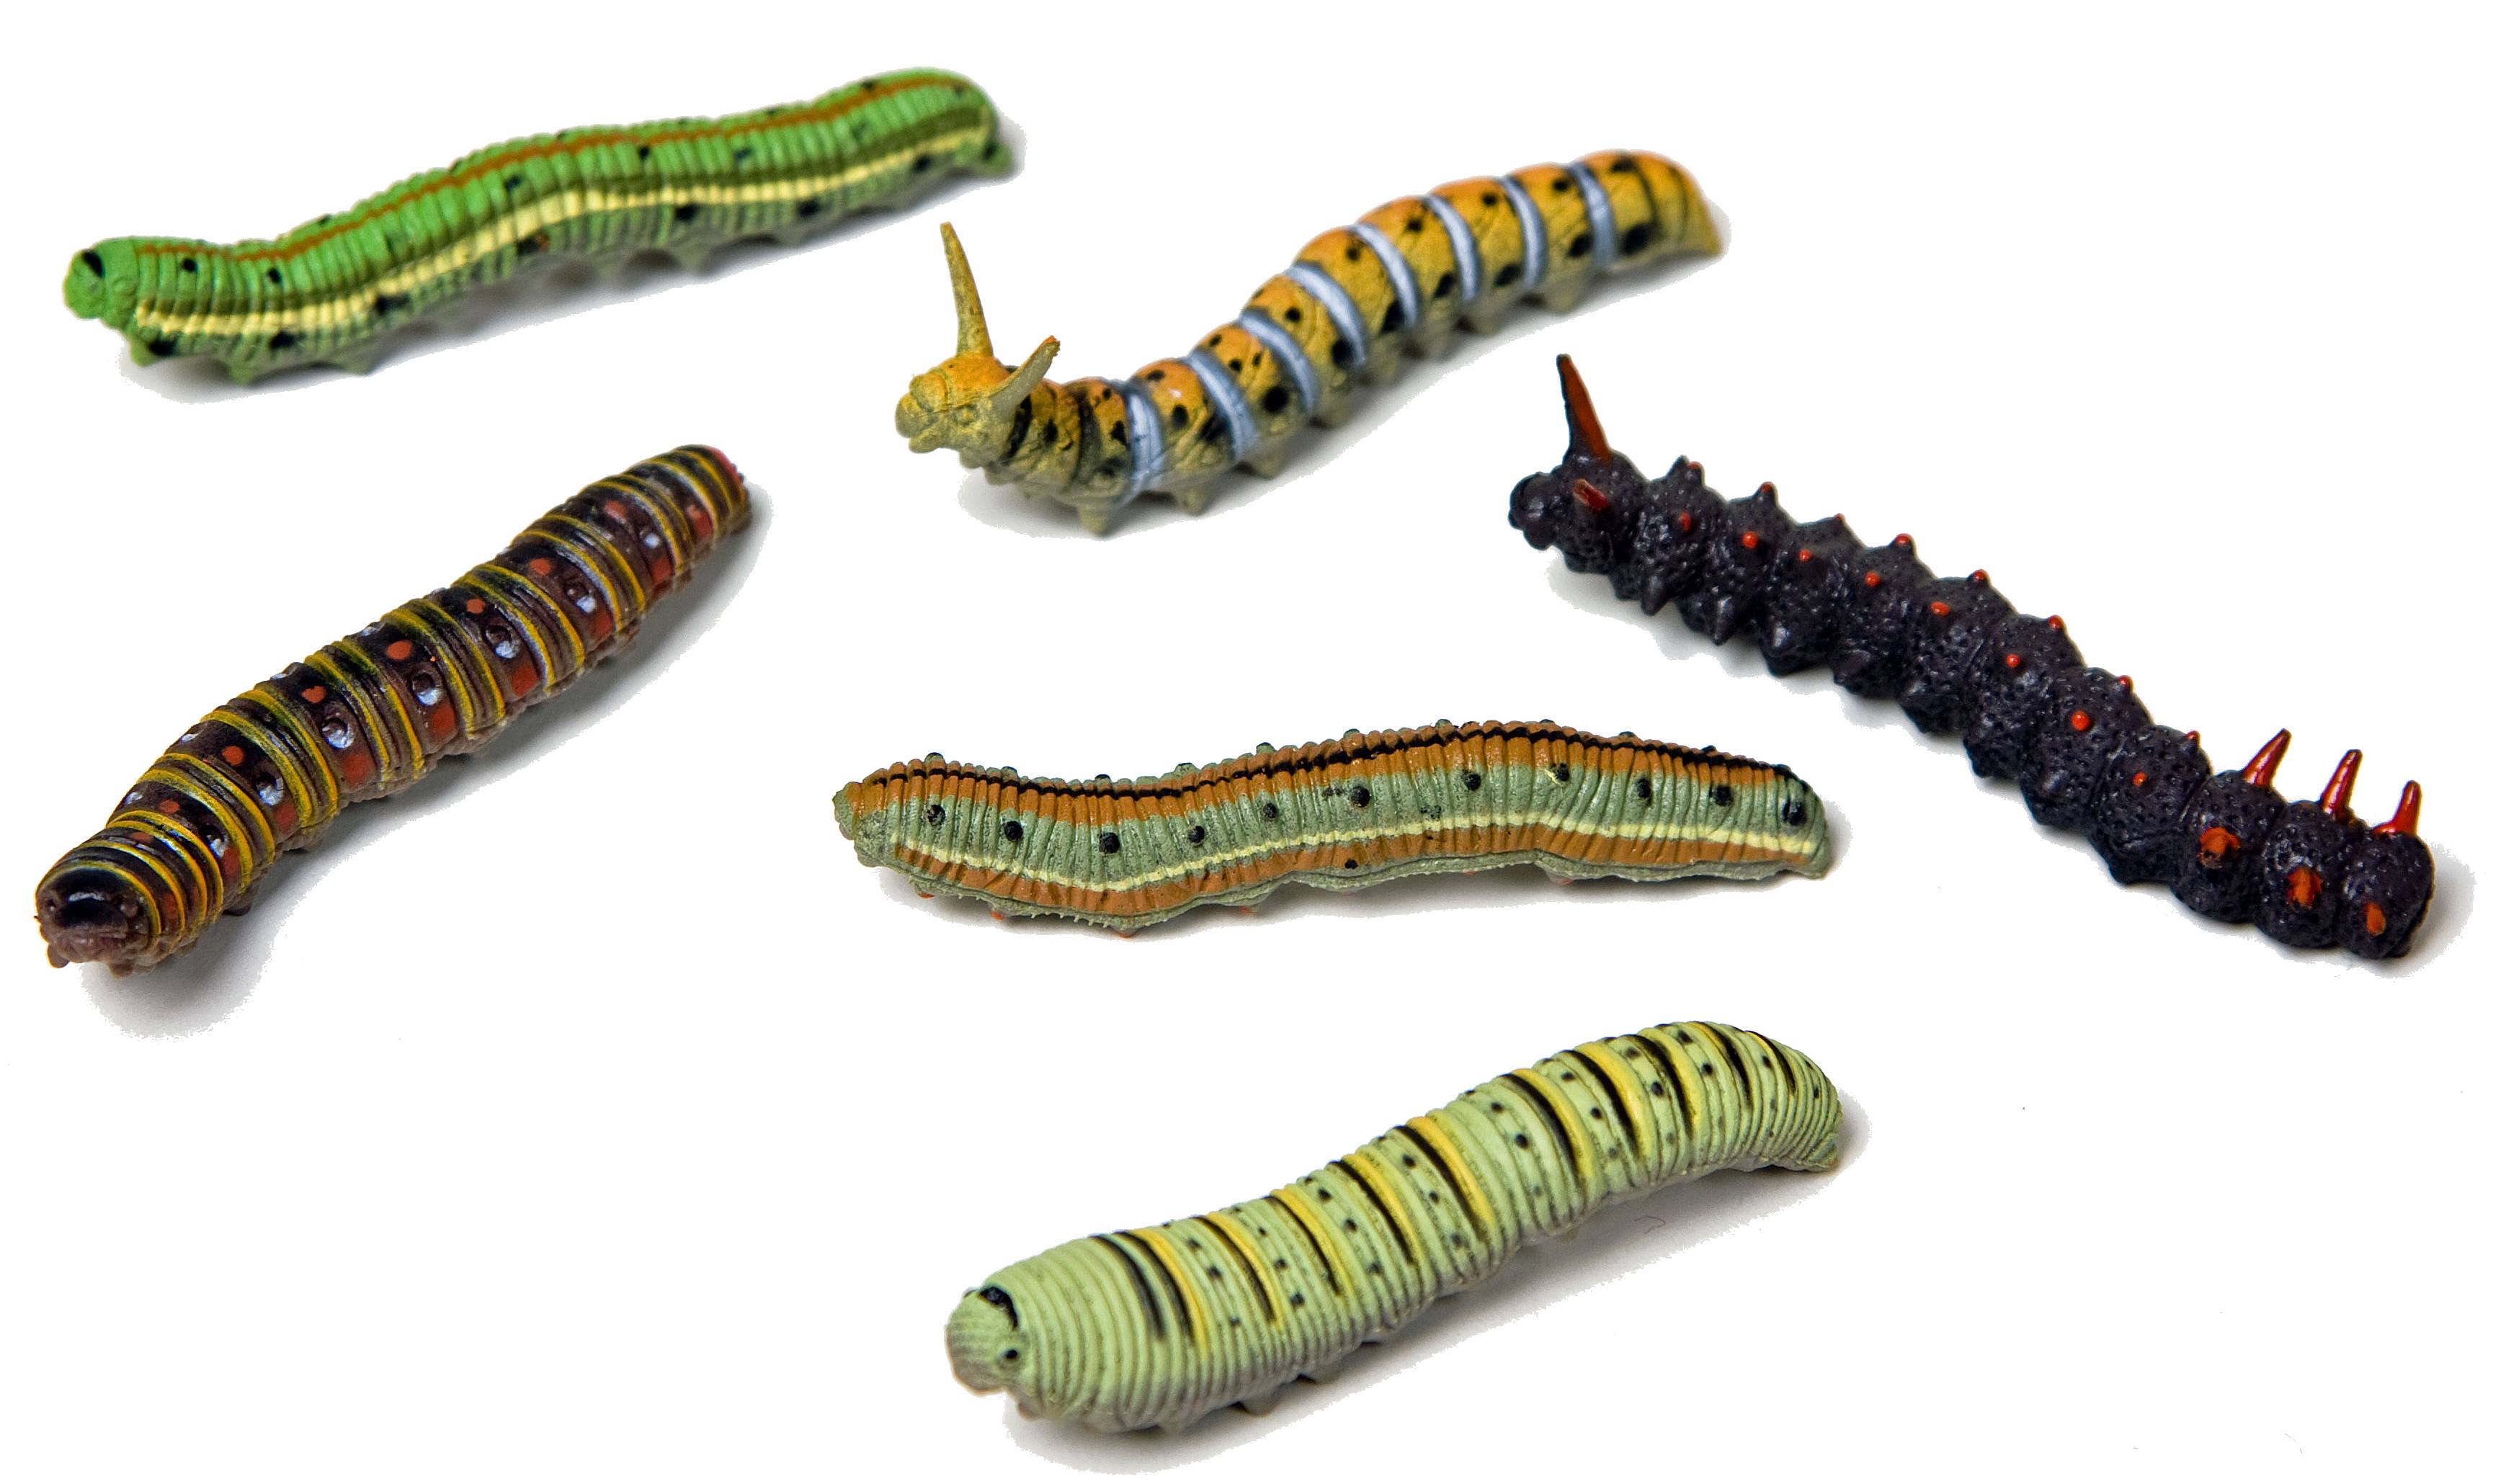 6 st ck raupen insekten krabbeltier dekoration deko for Dekoration 70iger jahre